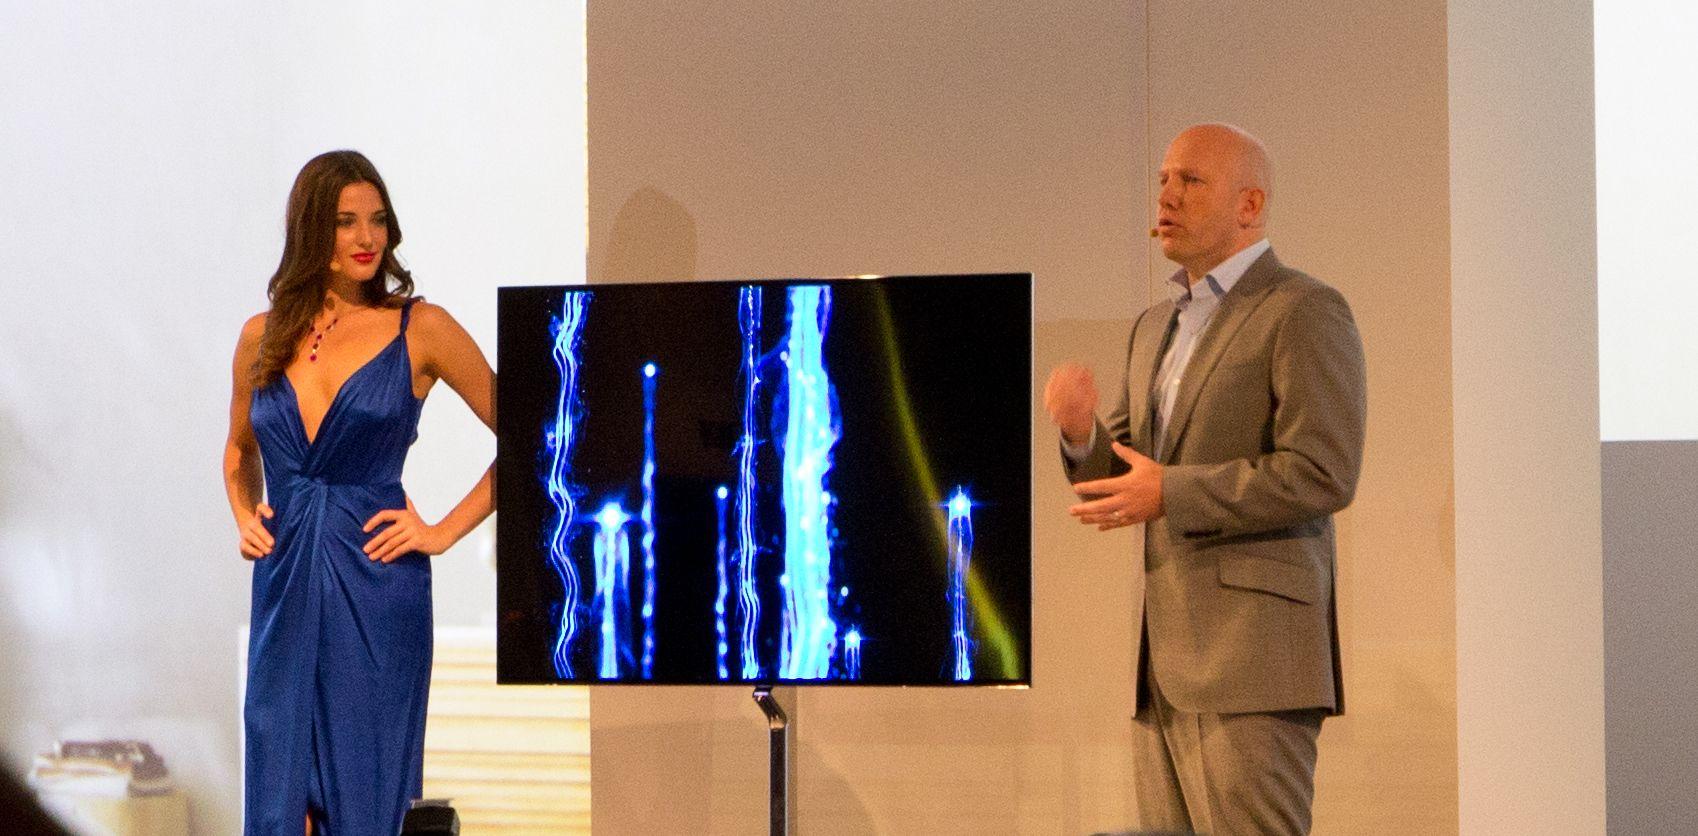 Samsung med sin 55 tommer store OLED-TV på IFA-messen i Berlin i fjor høst.Foto: Rolf B. Wegner, Hardware.no